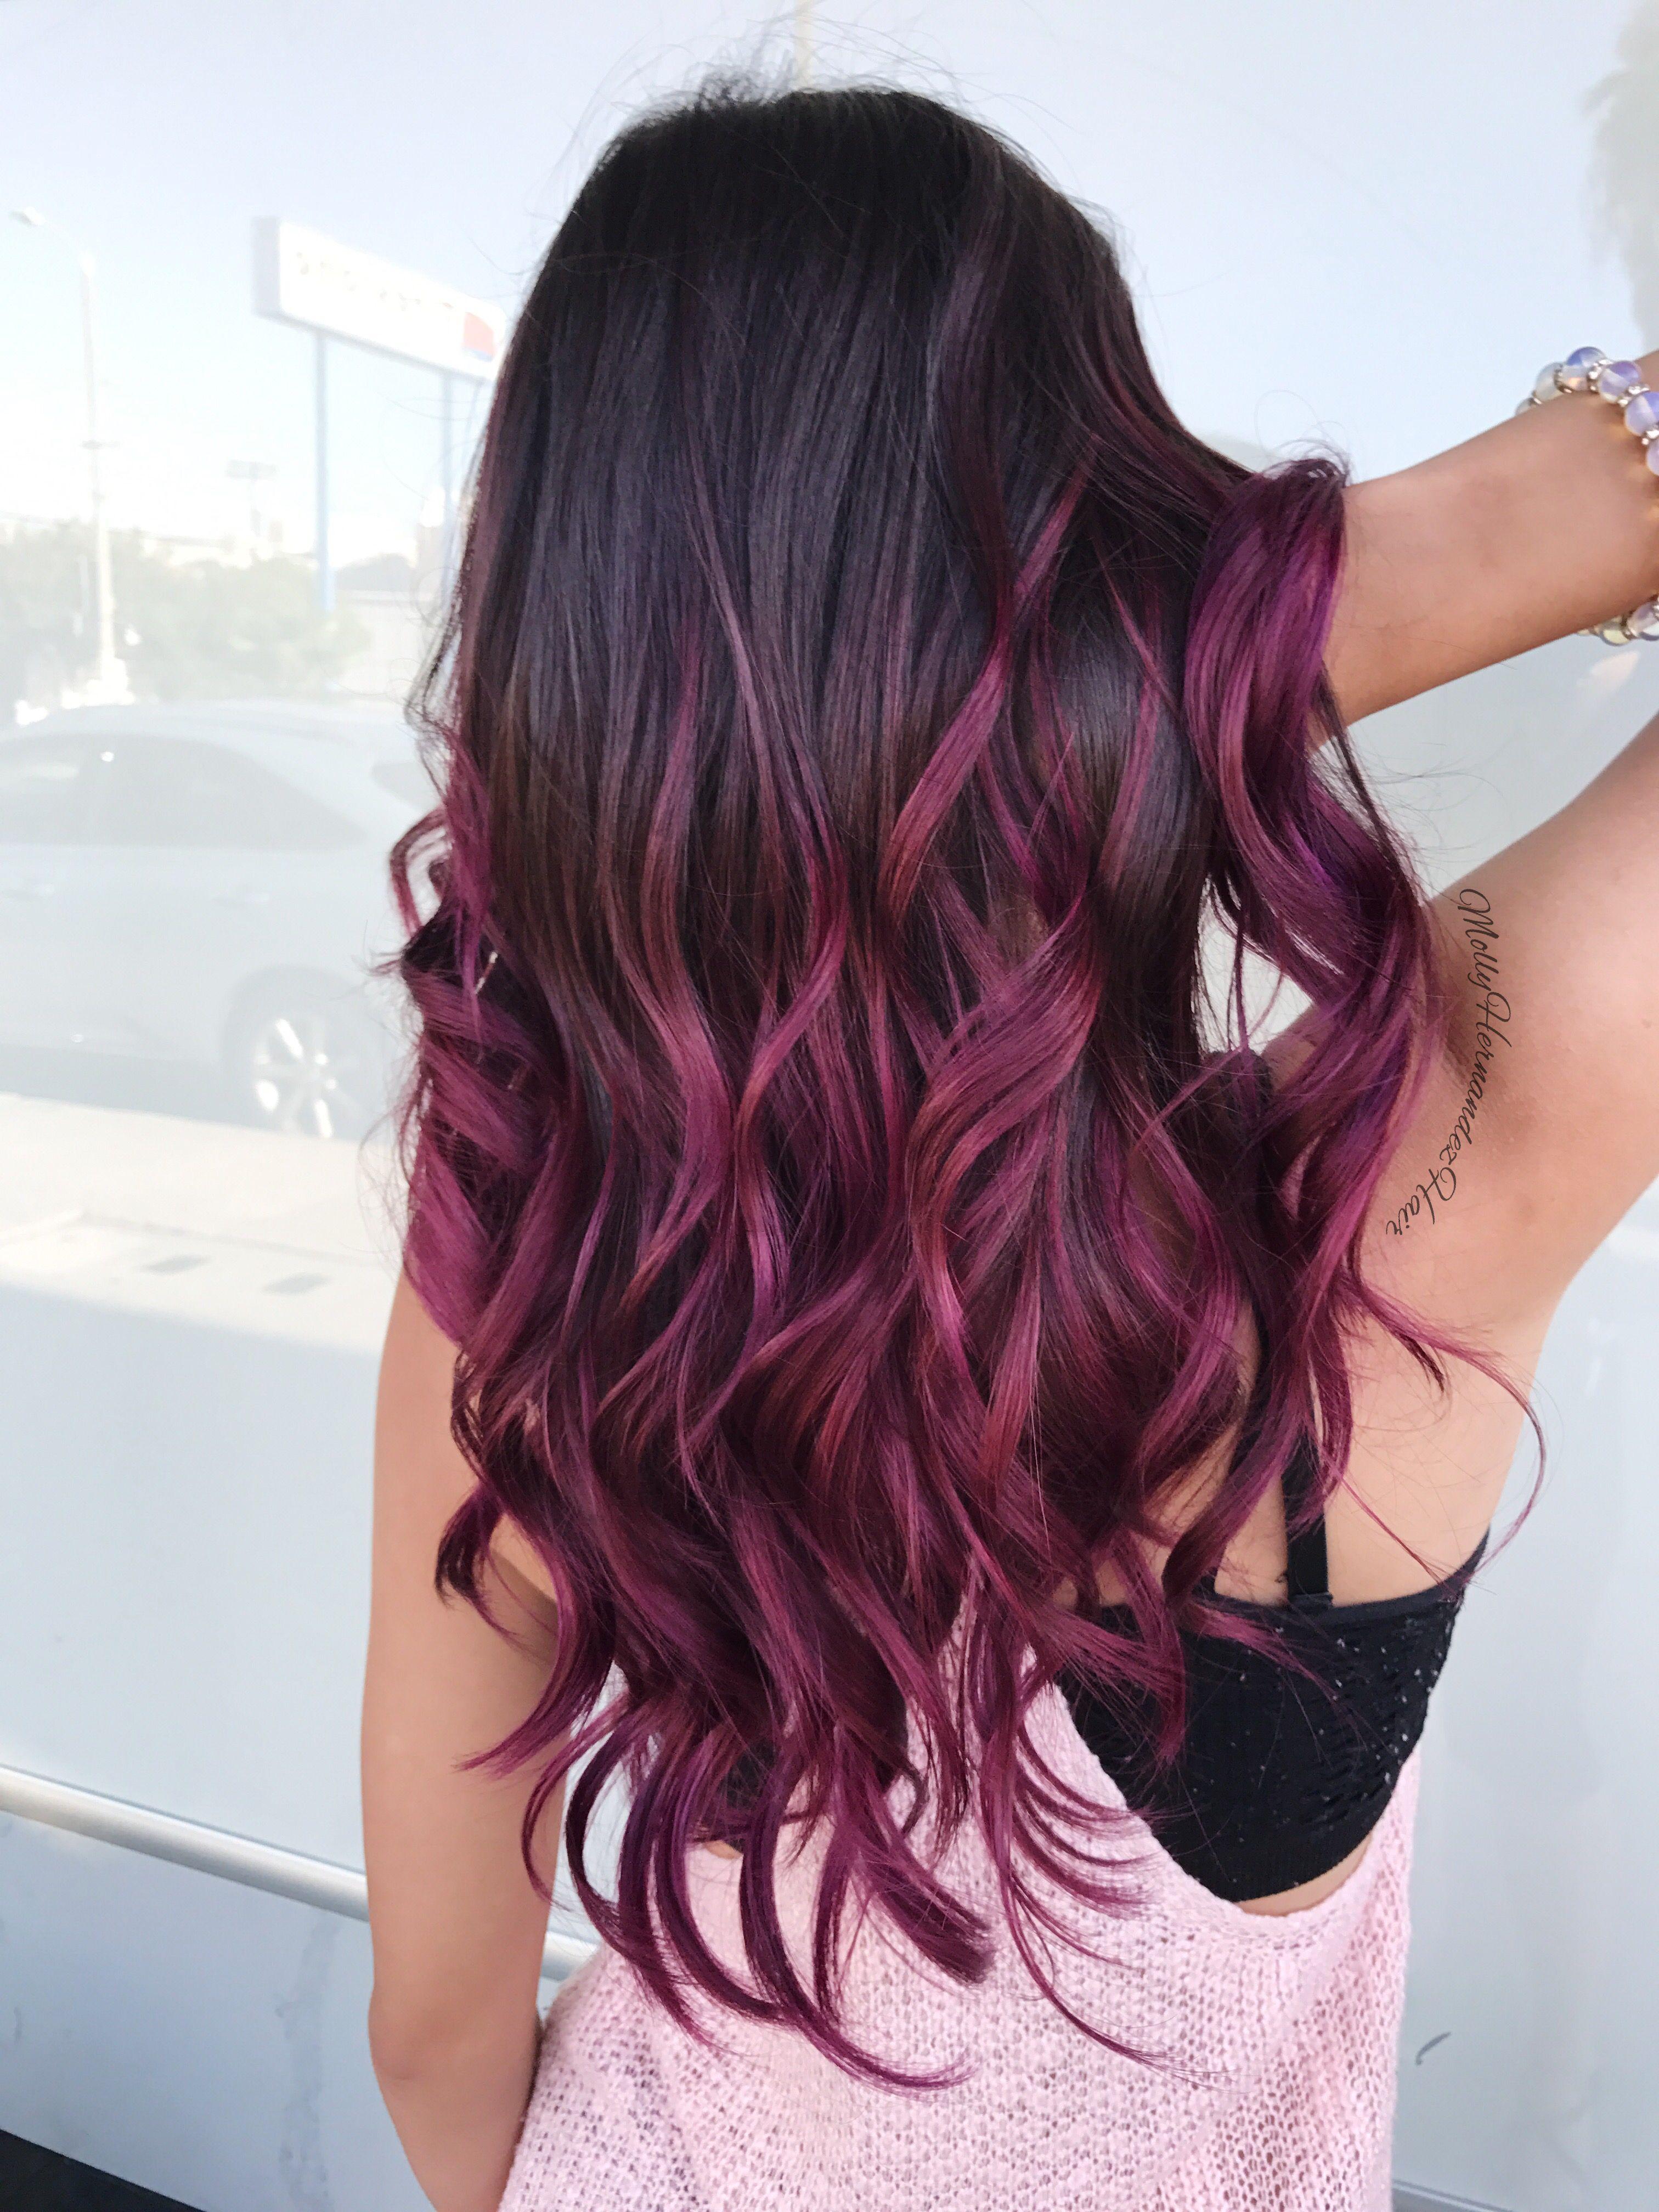 Burgundy Henna Hair Dye: 13 Burgundy Hair Color Shades For Indian Skin Tones